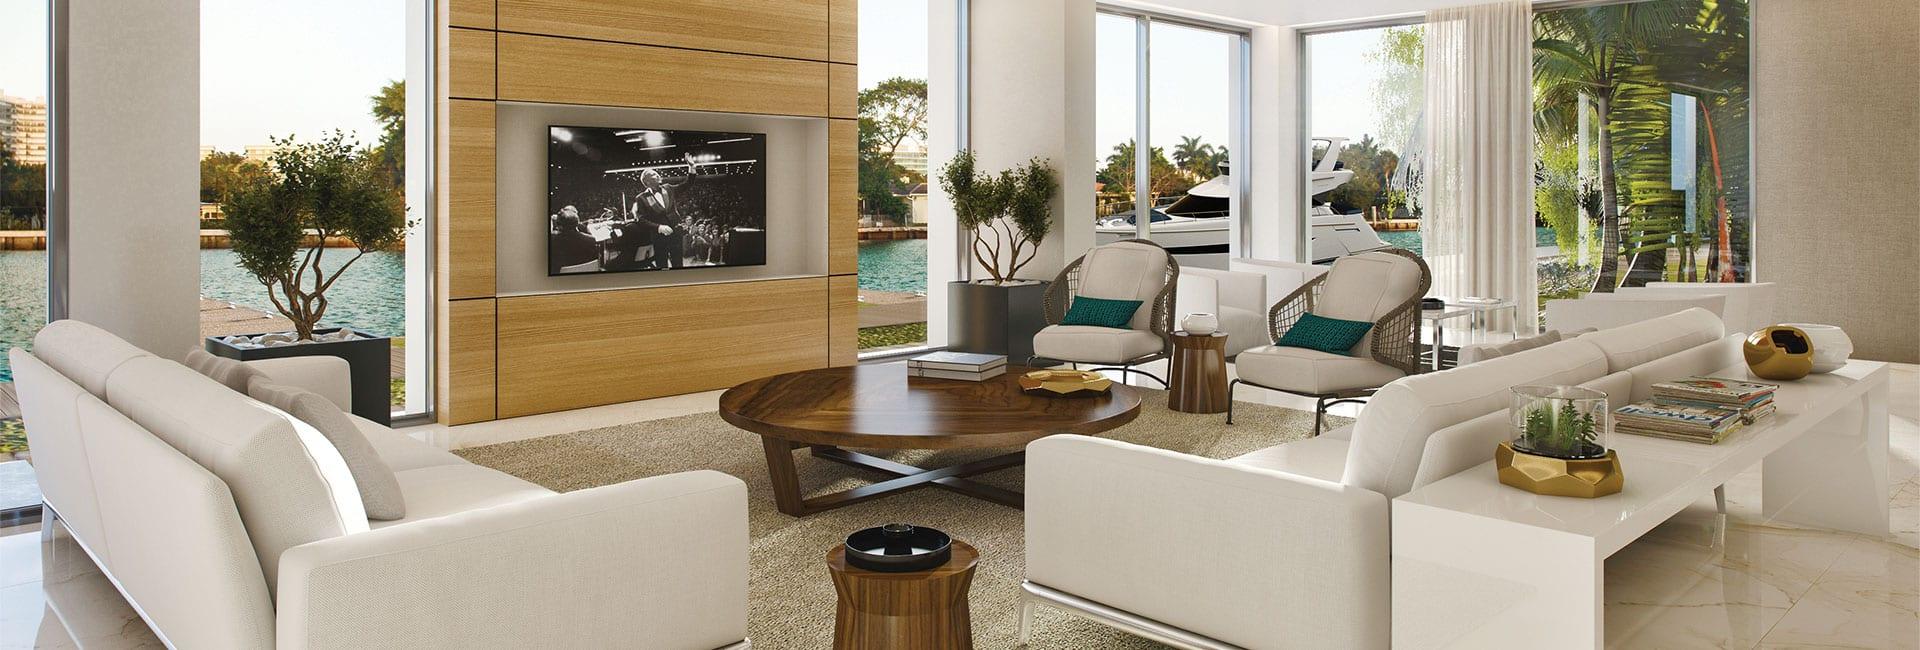 Bijou Bay Harbor Life Style